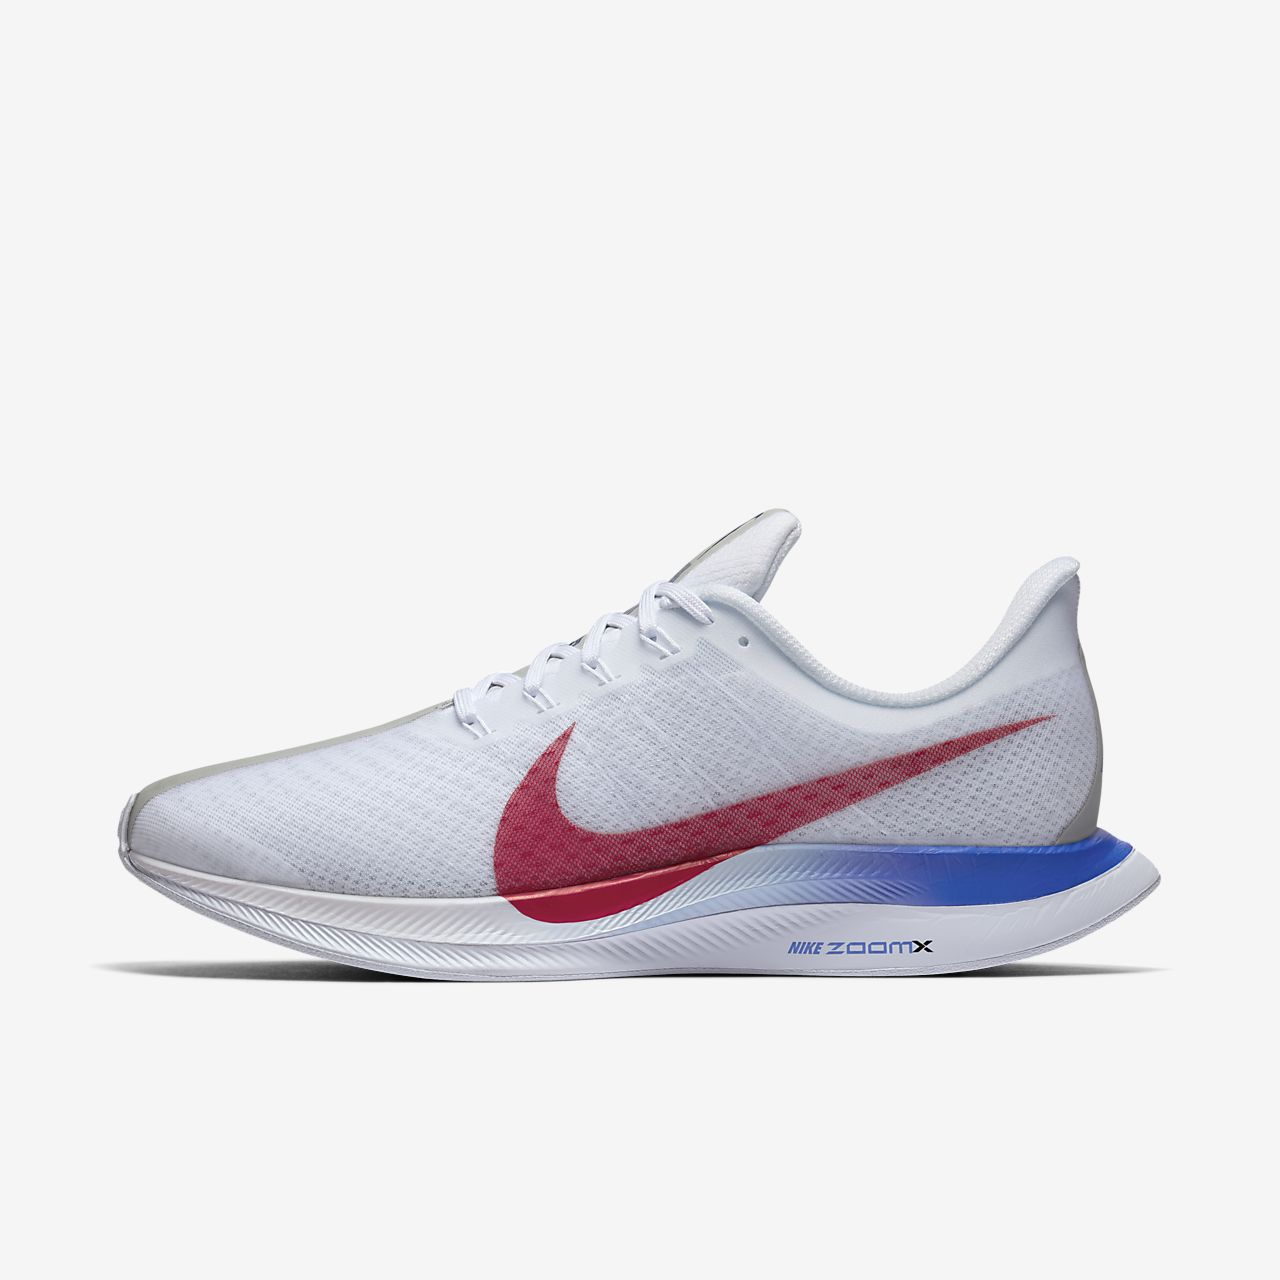 Sapatilhas de running Nike Zoom Pegasus 35 Turbo BRS para homem